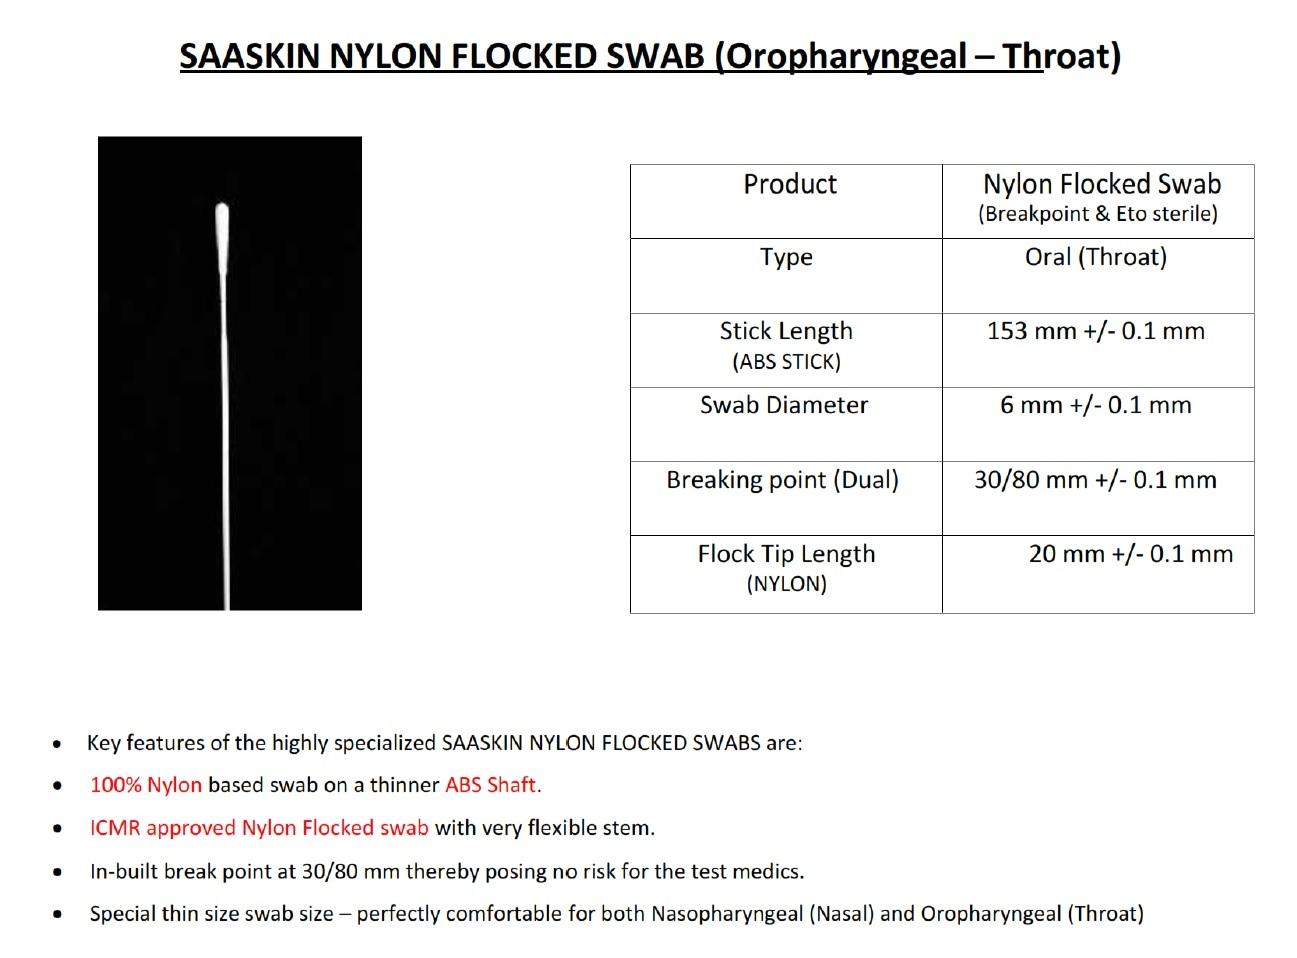 Nylon Flocked Swab Stick